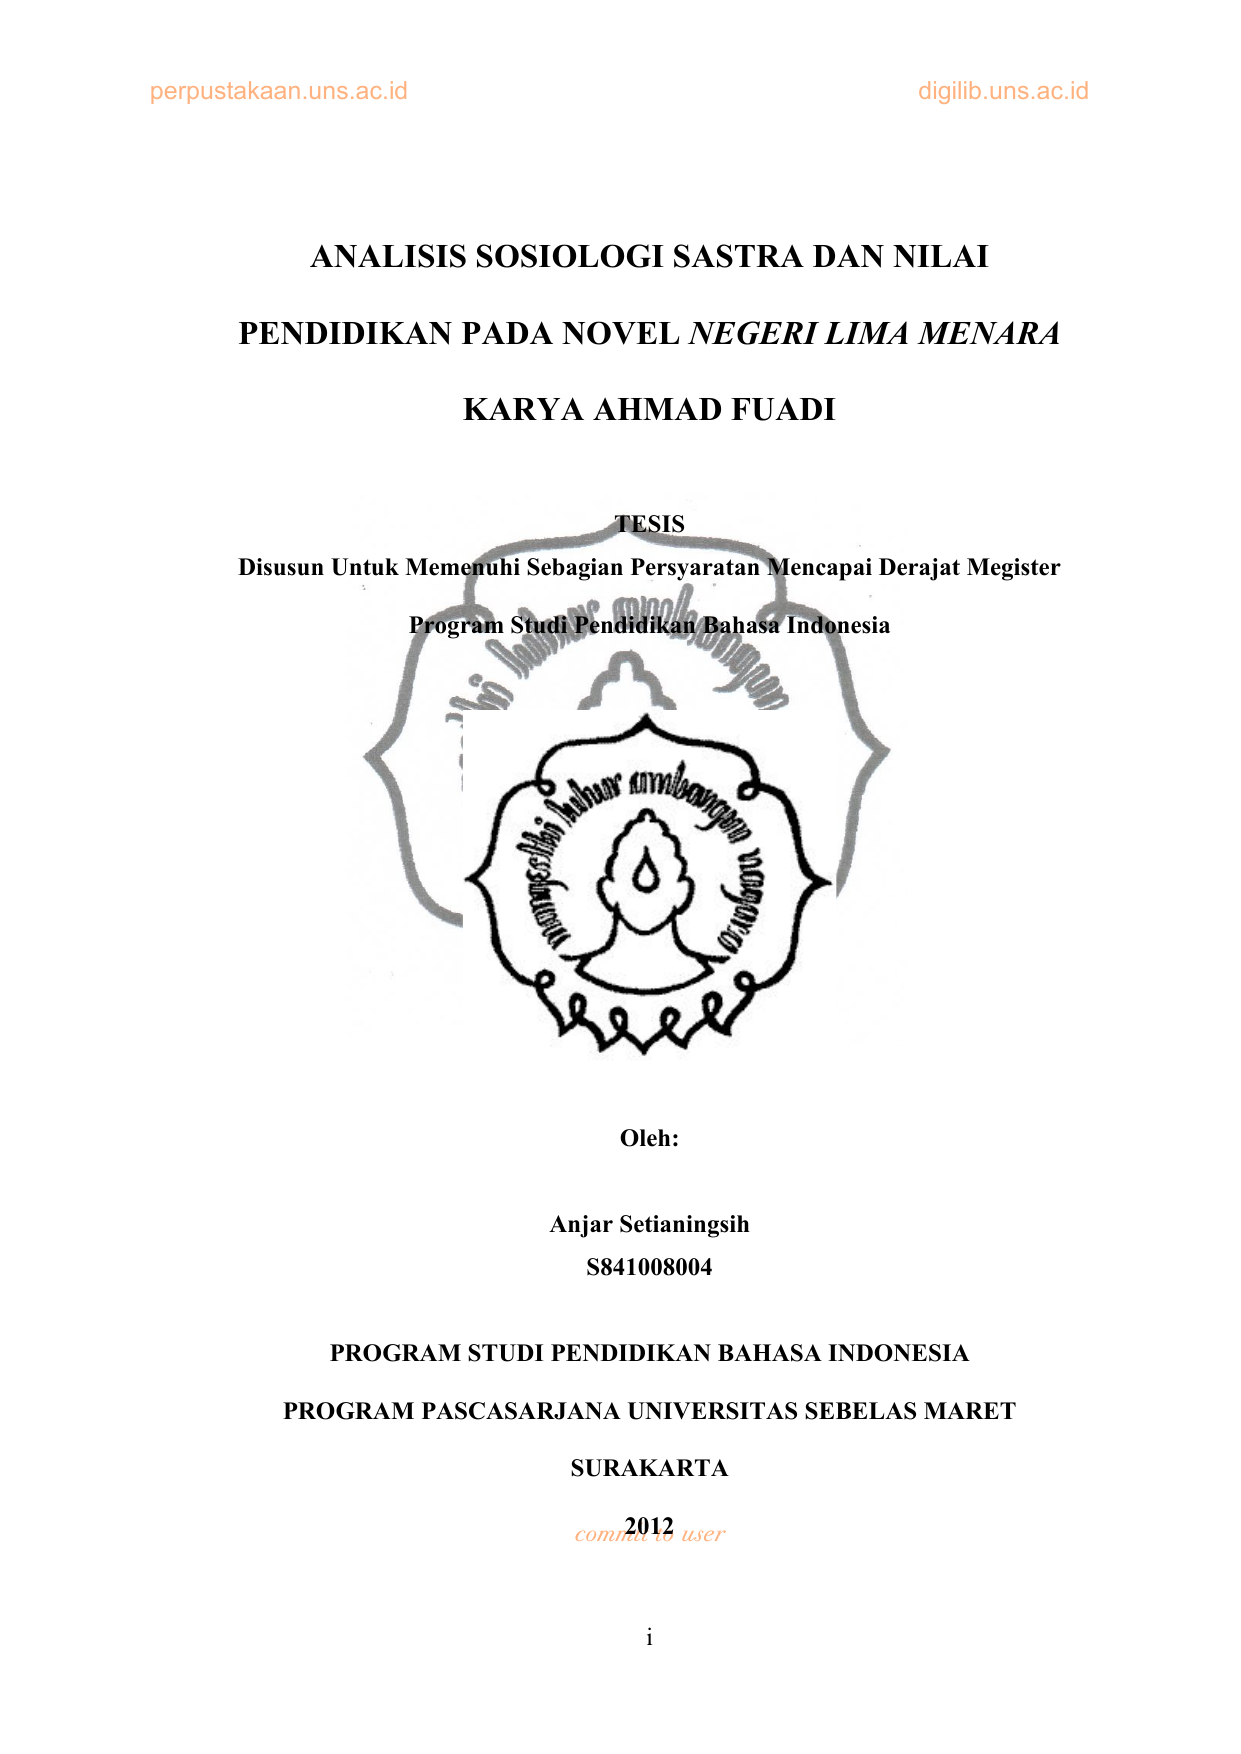 Analisis Sosiologi Sastra Dan Nilai Pendidikan Pada Novel Negeri